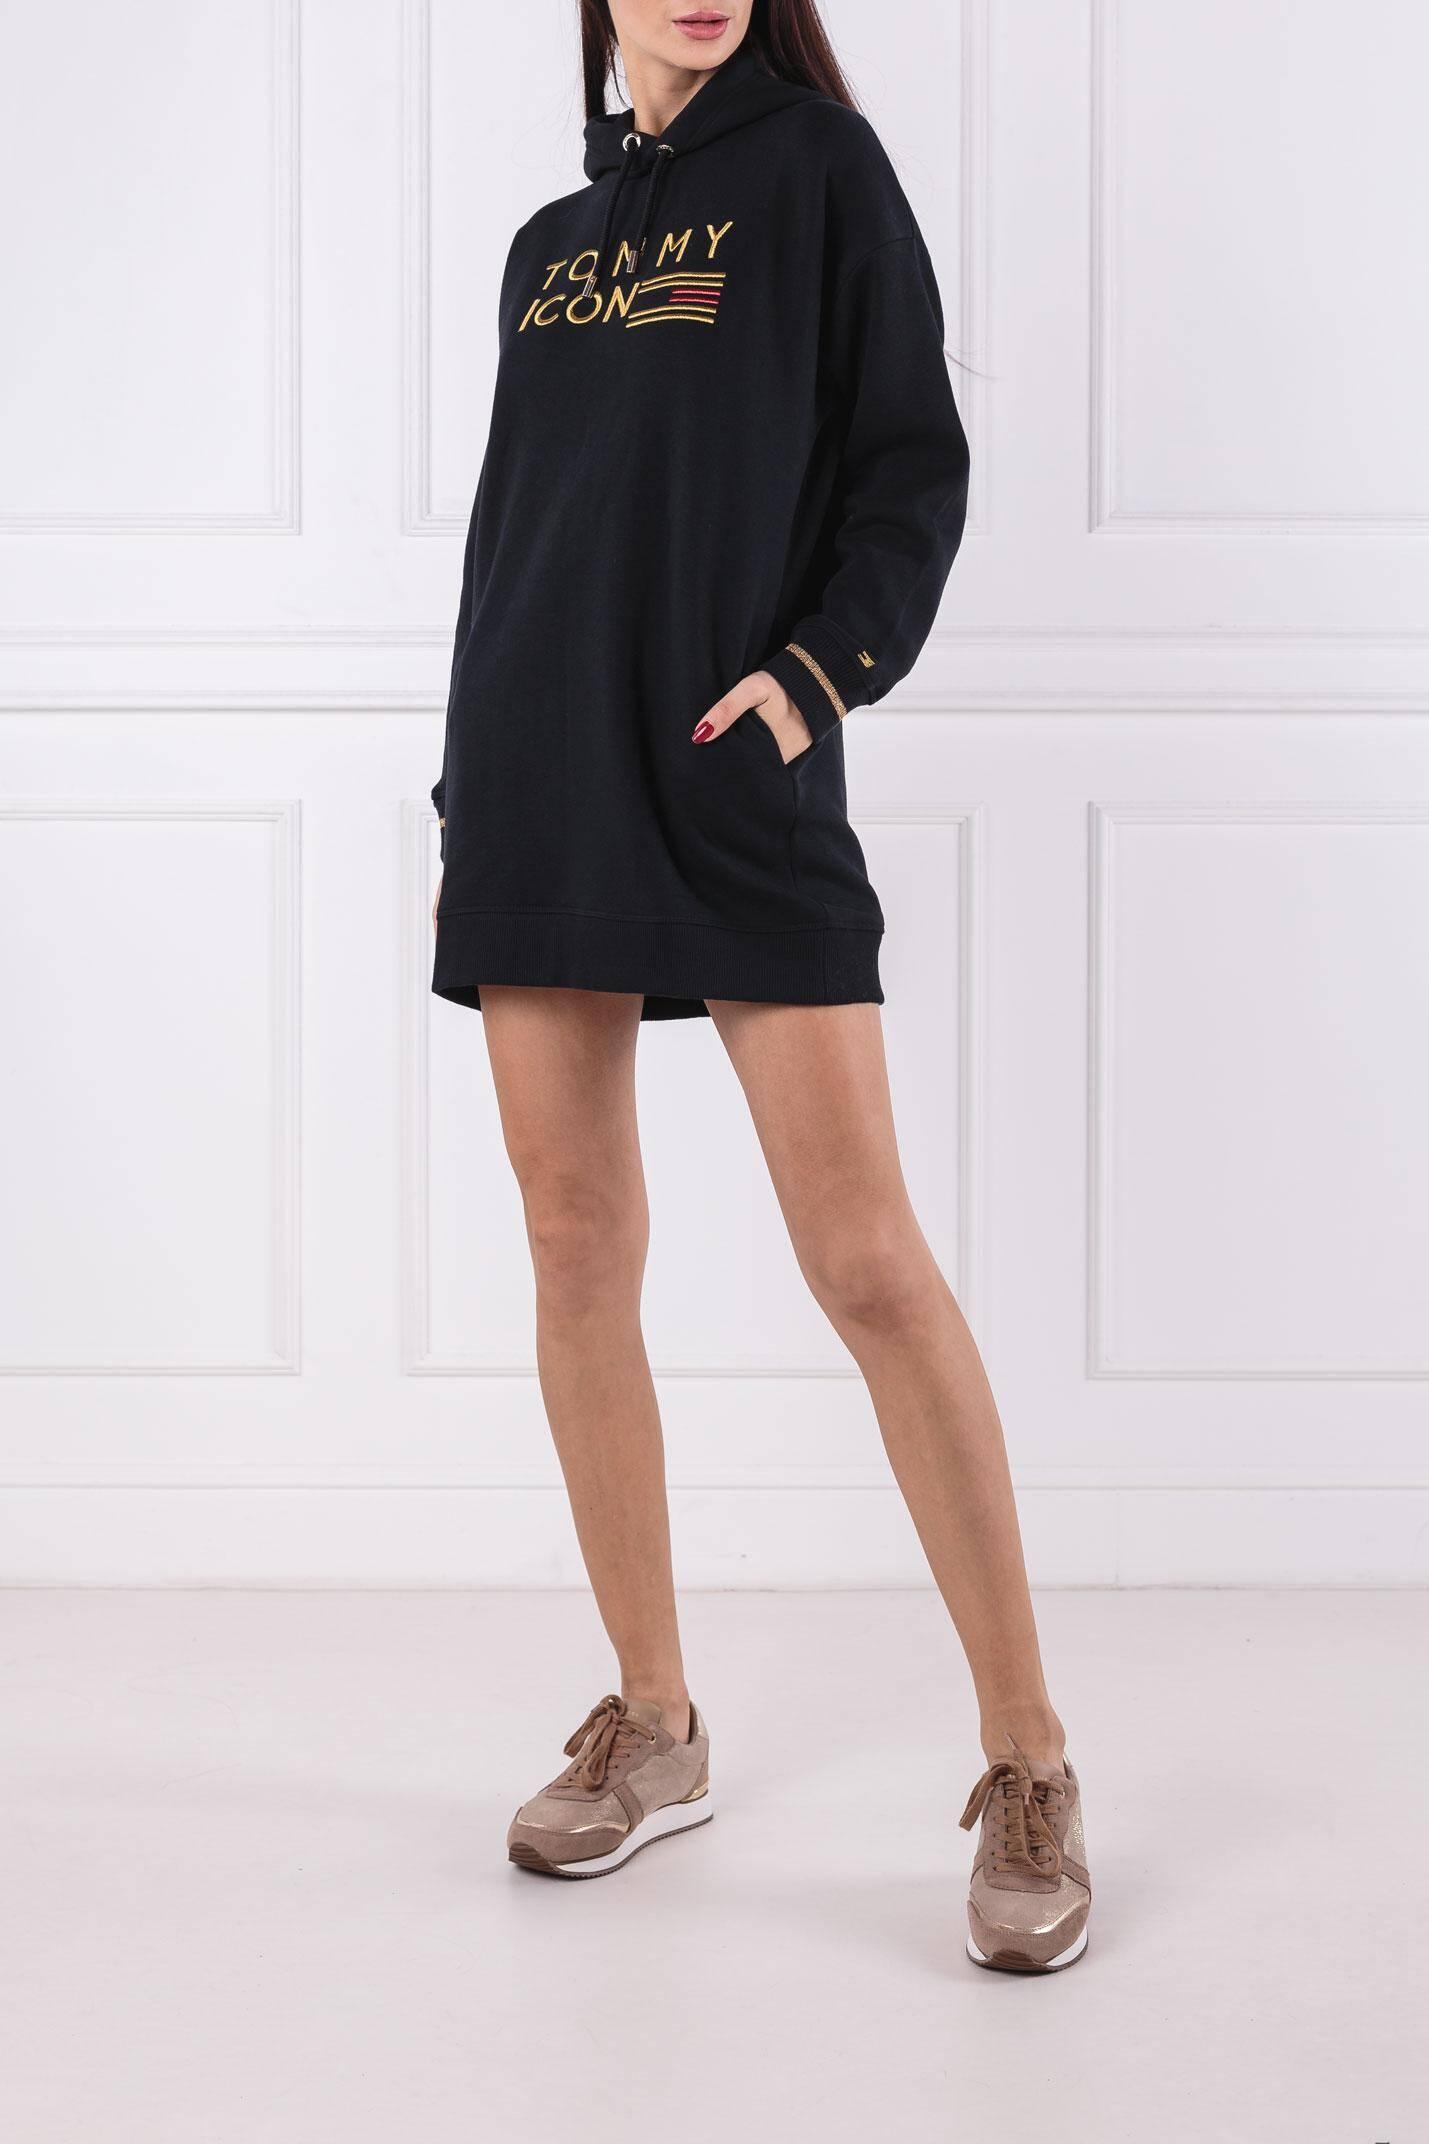 35fd1de176a Dress ICON NOELLE Tommy Hilfiger   Black   Gomez.pl/en